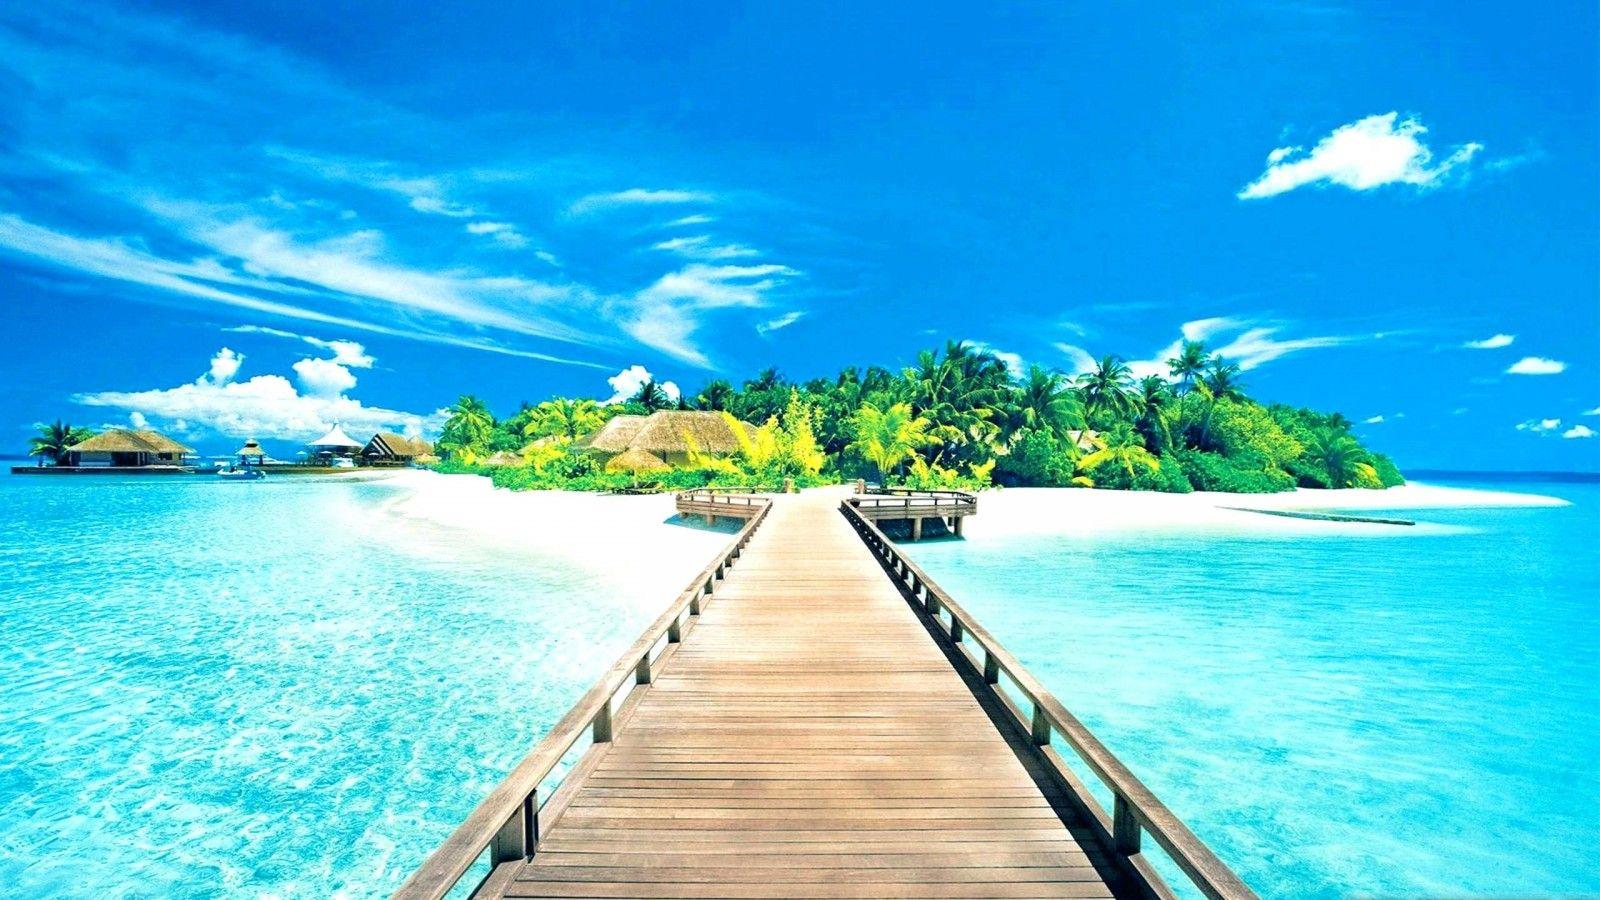 45 Beach Scene Wallpapers   Download at WallpaperBro 1600x900